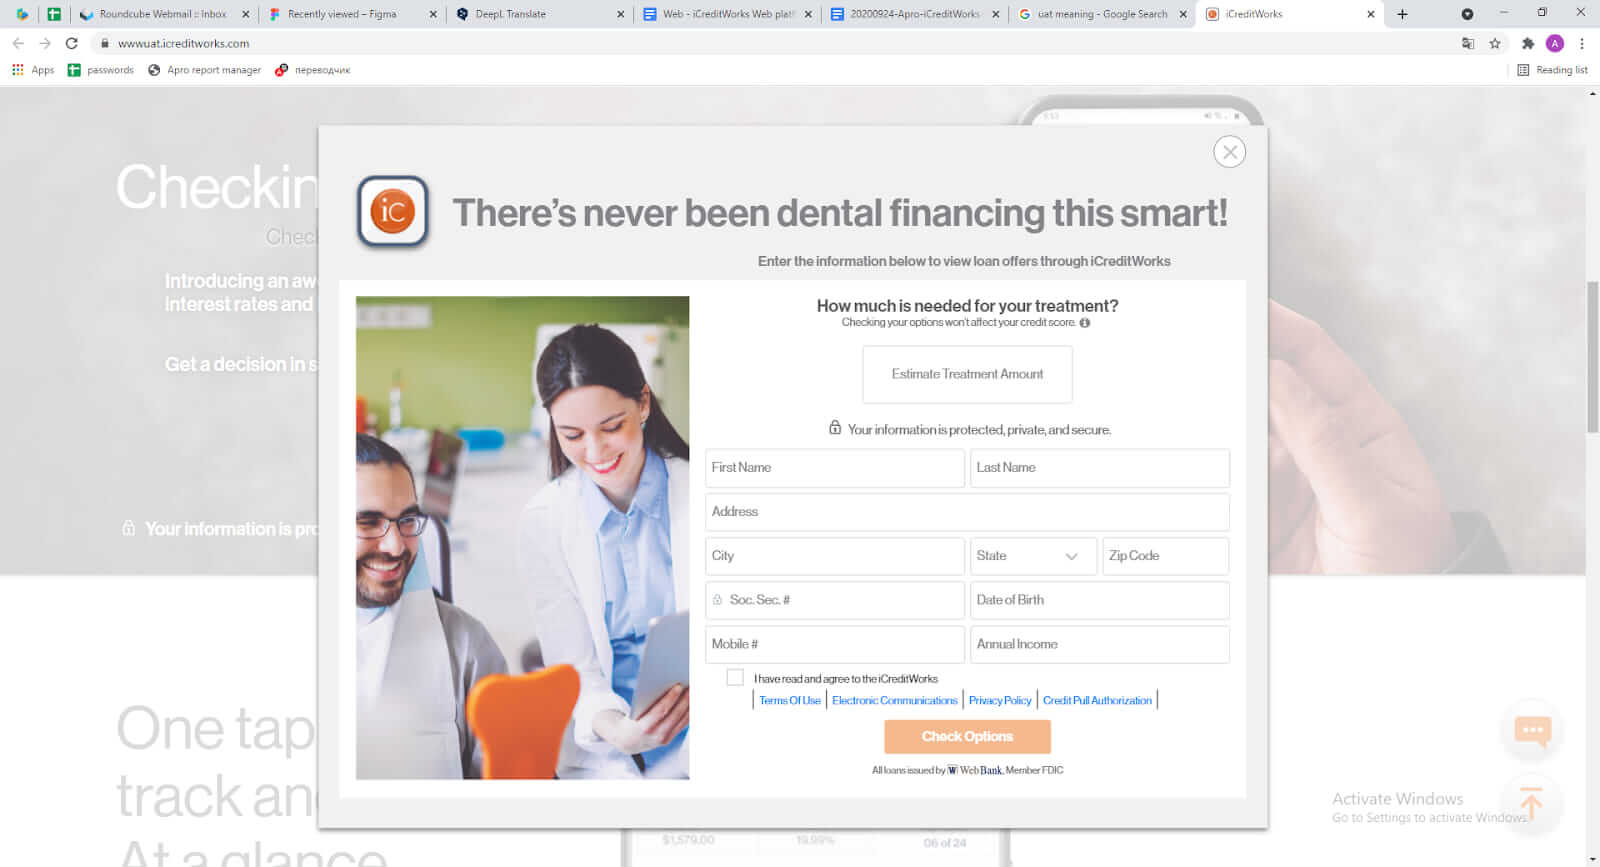 loans to dental patients app